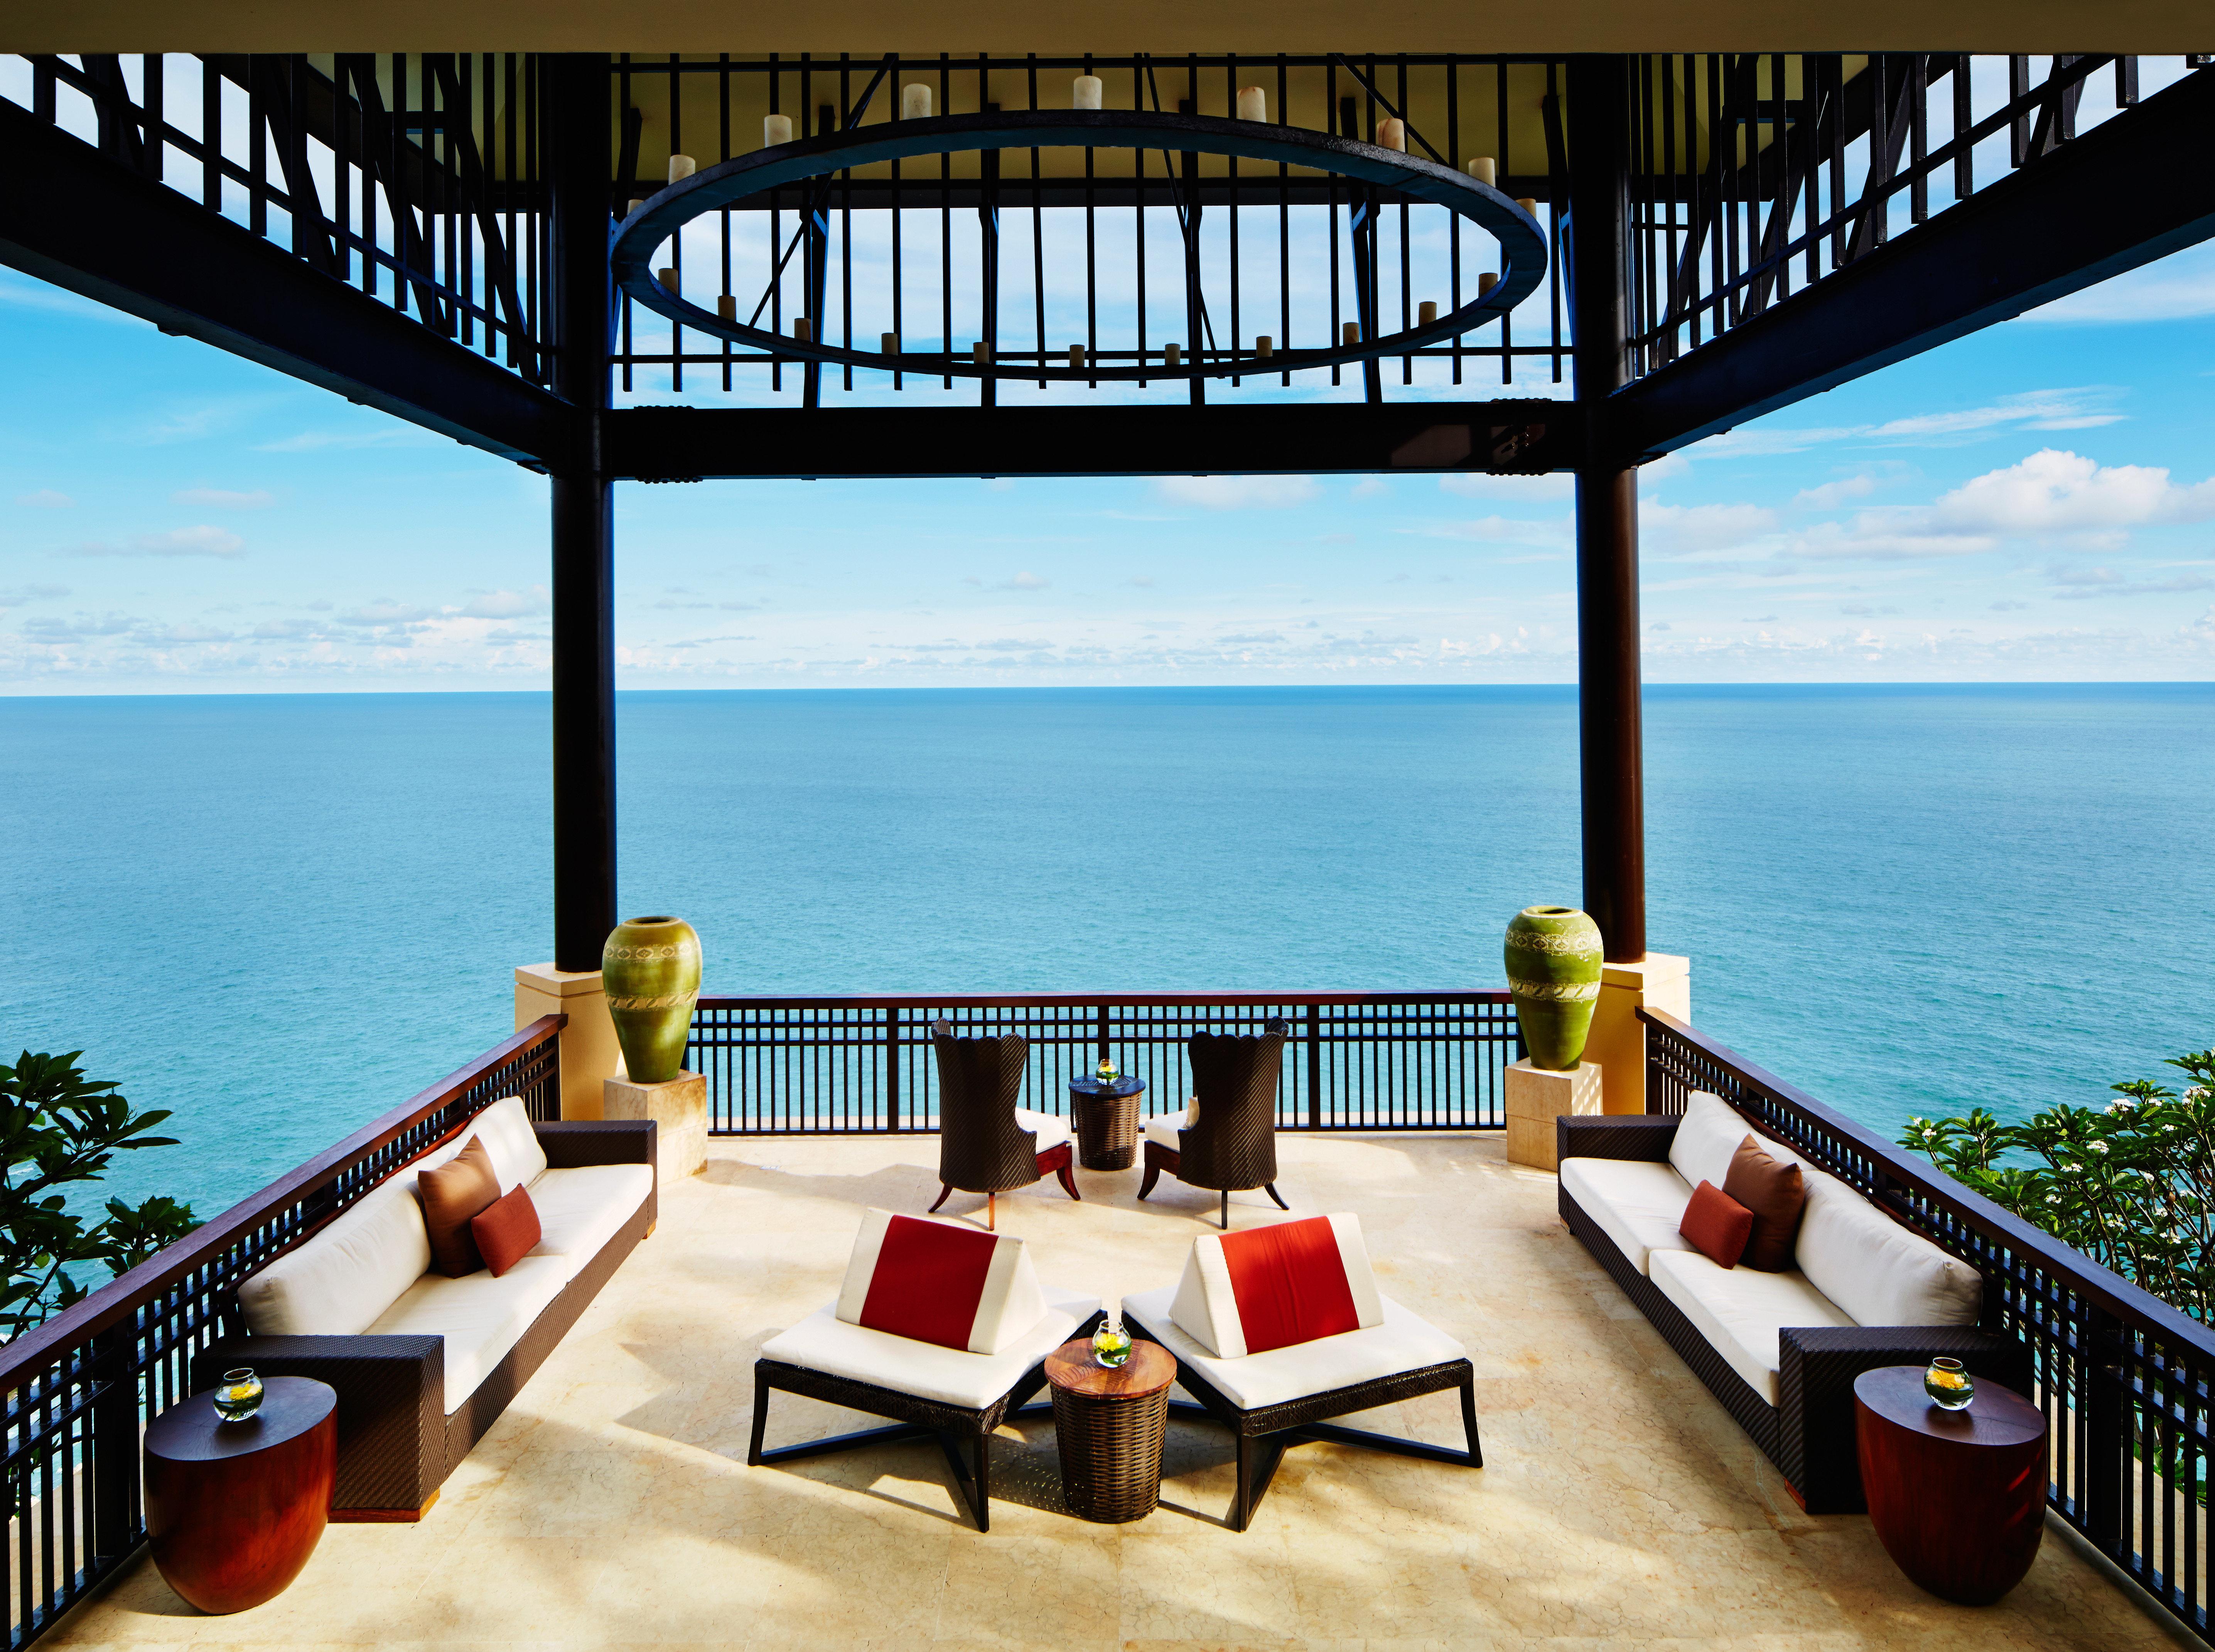 Beach Beachfront Deck Lounge Ocean water pier leisure overlooking property Resort scene Villa caribbean Sea swimming pool restaurant